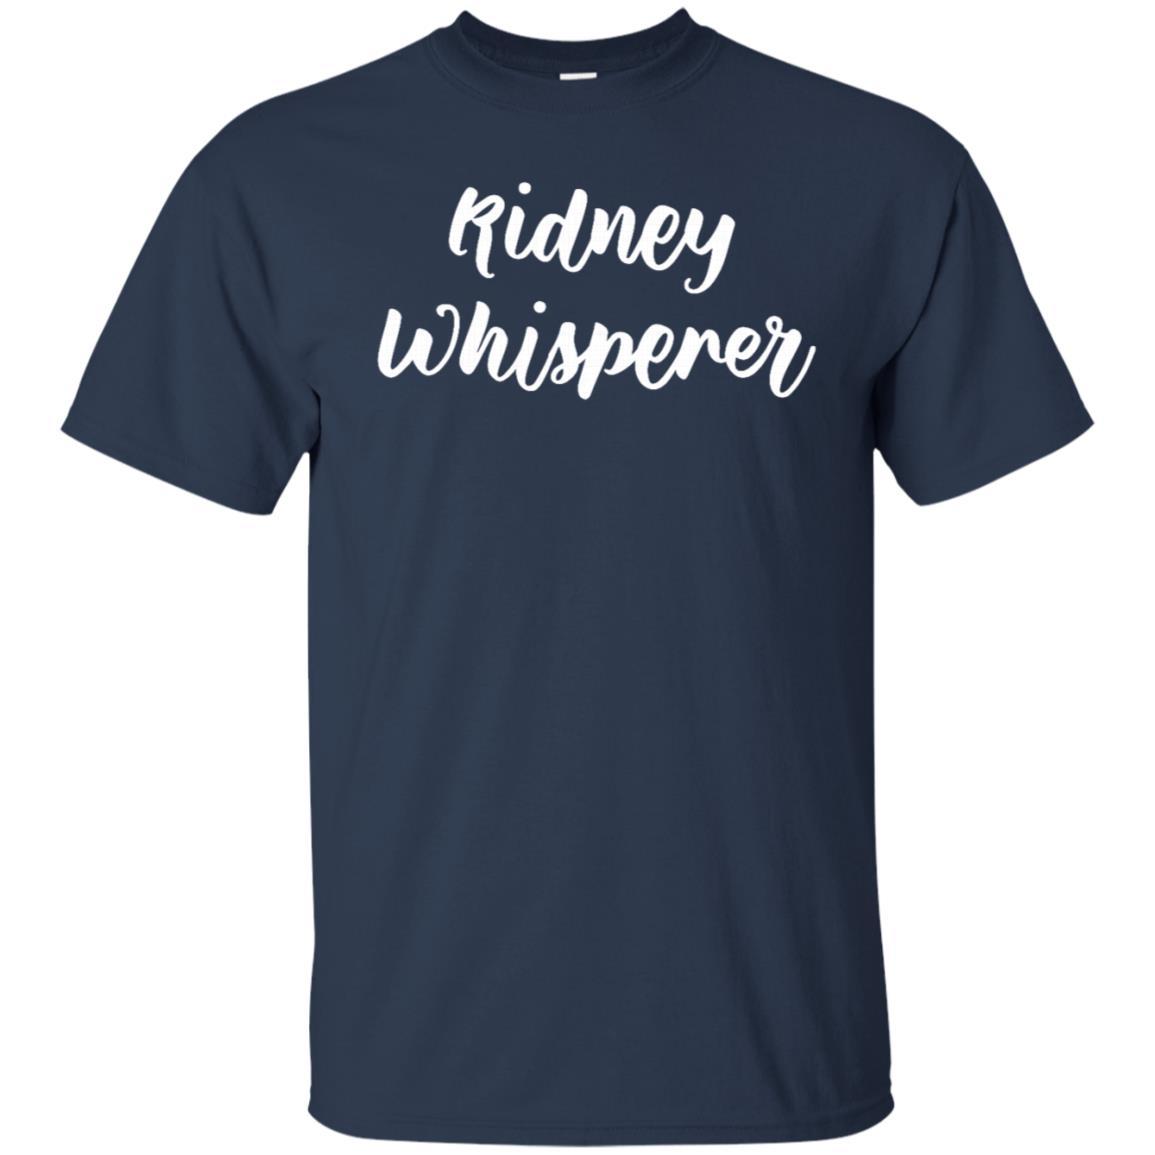 Kidney Whisperer Dialysis Nurse Nephrology Unisex Short Sleeve